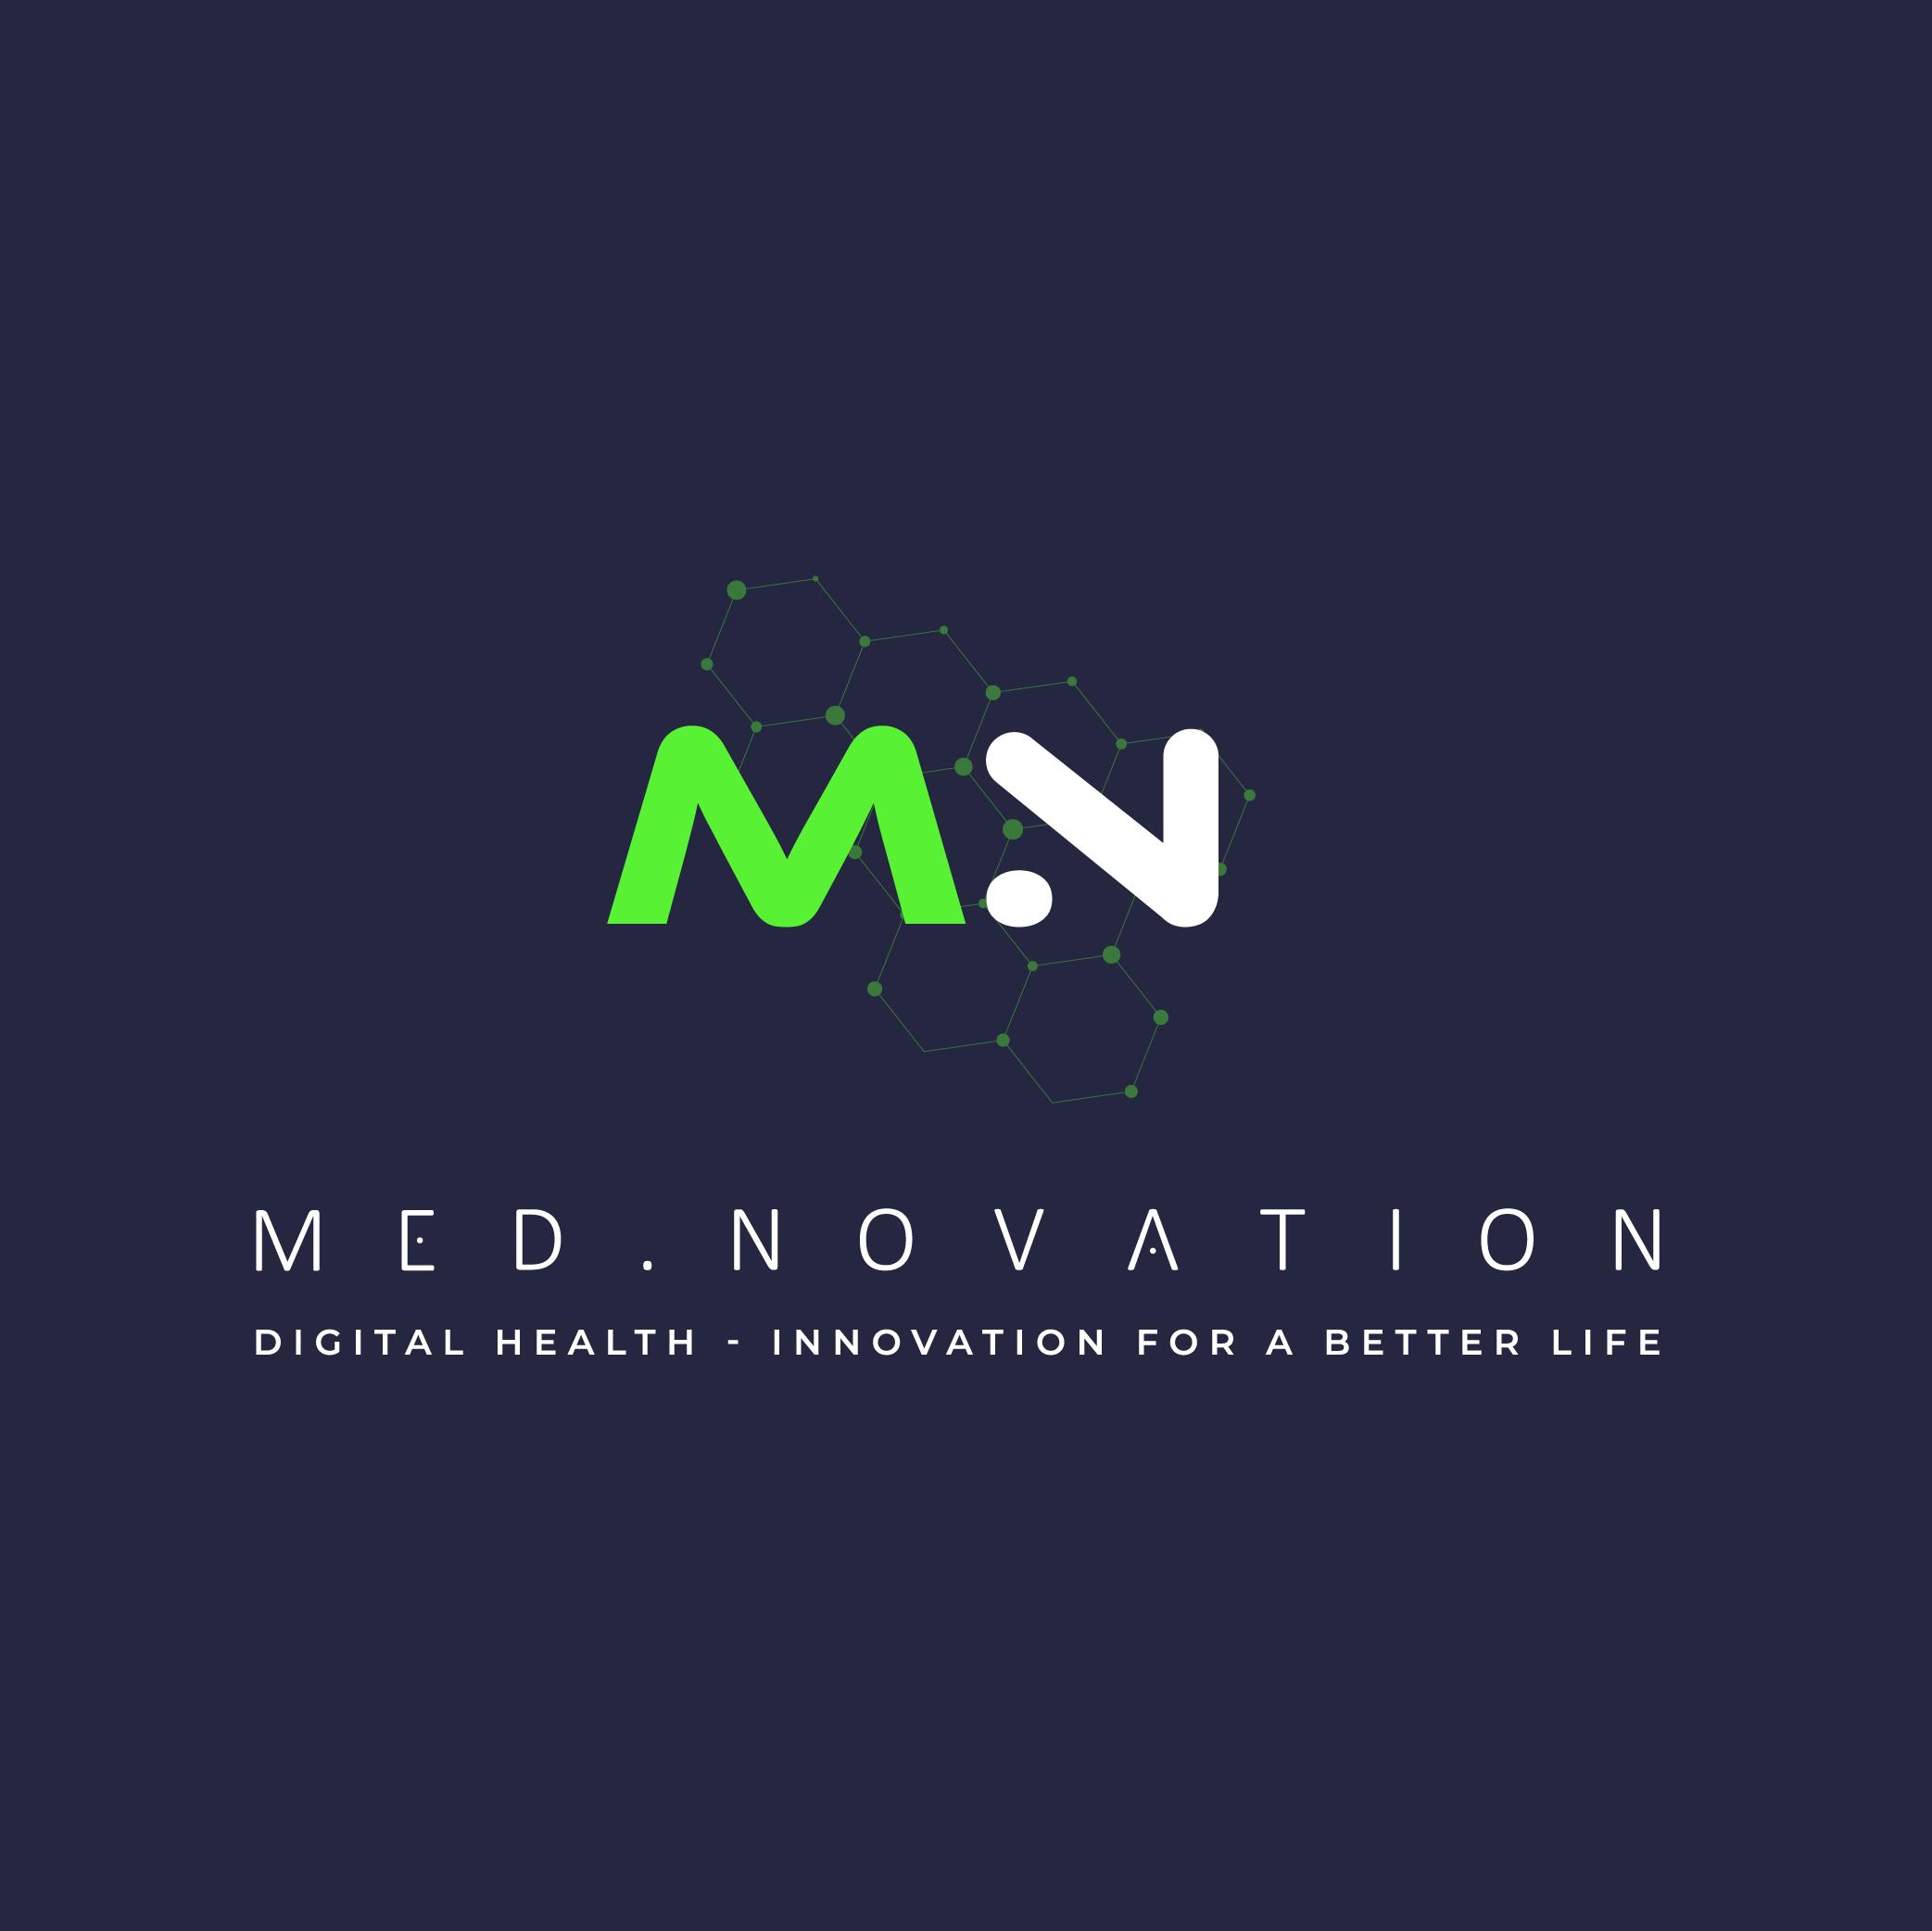 MED.NOVATION